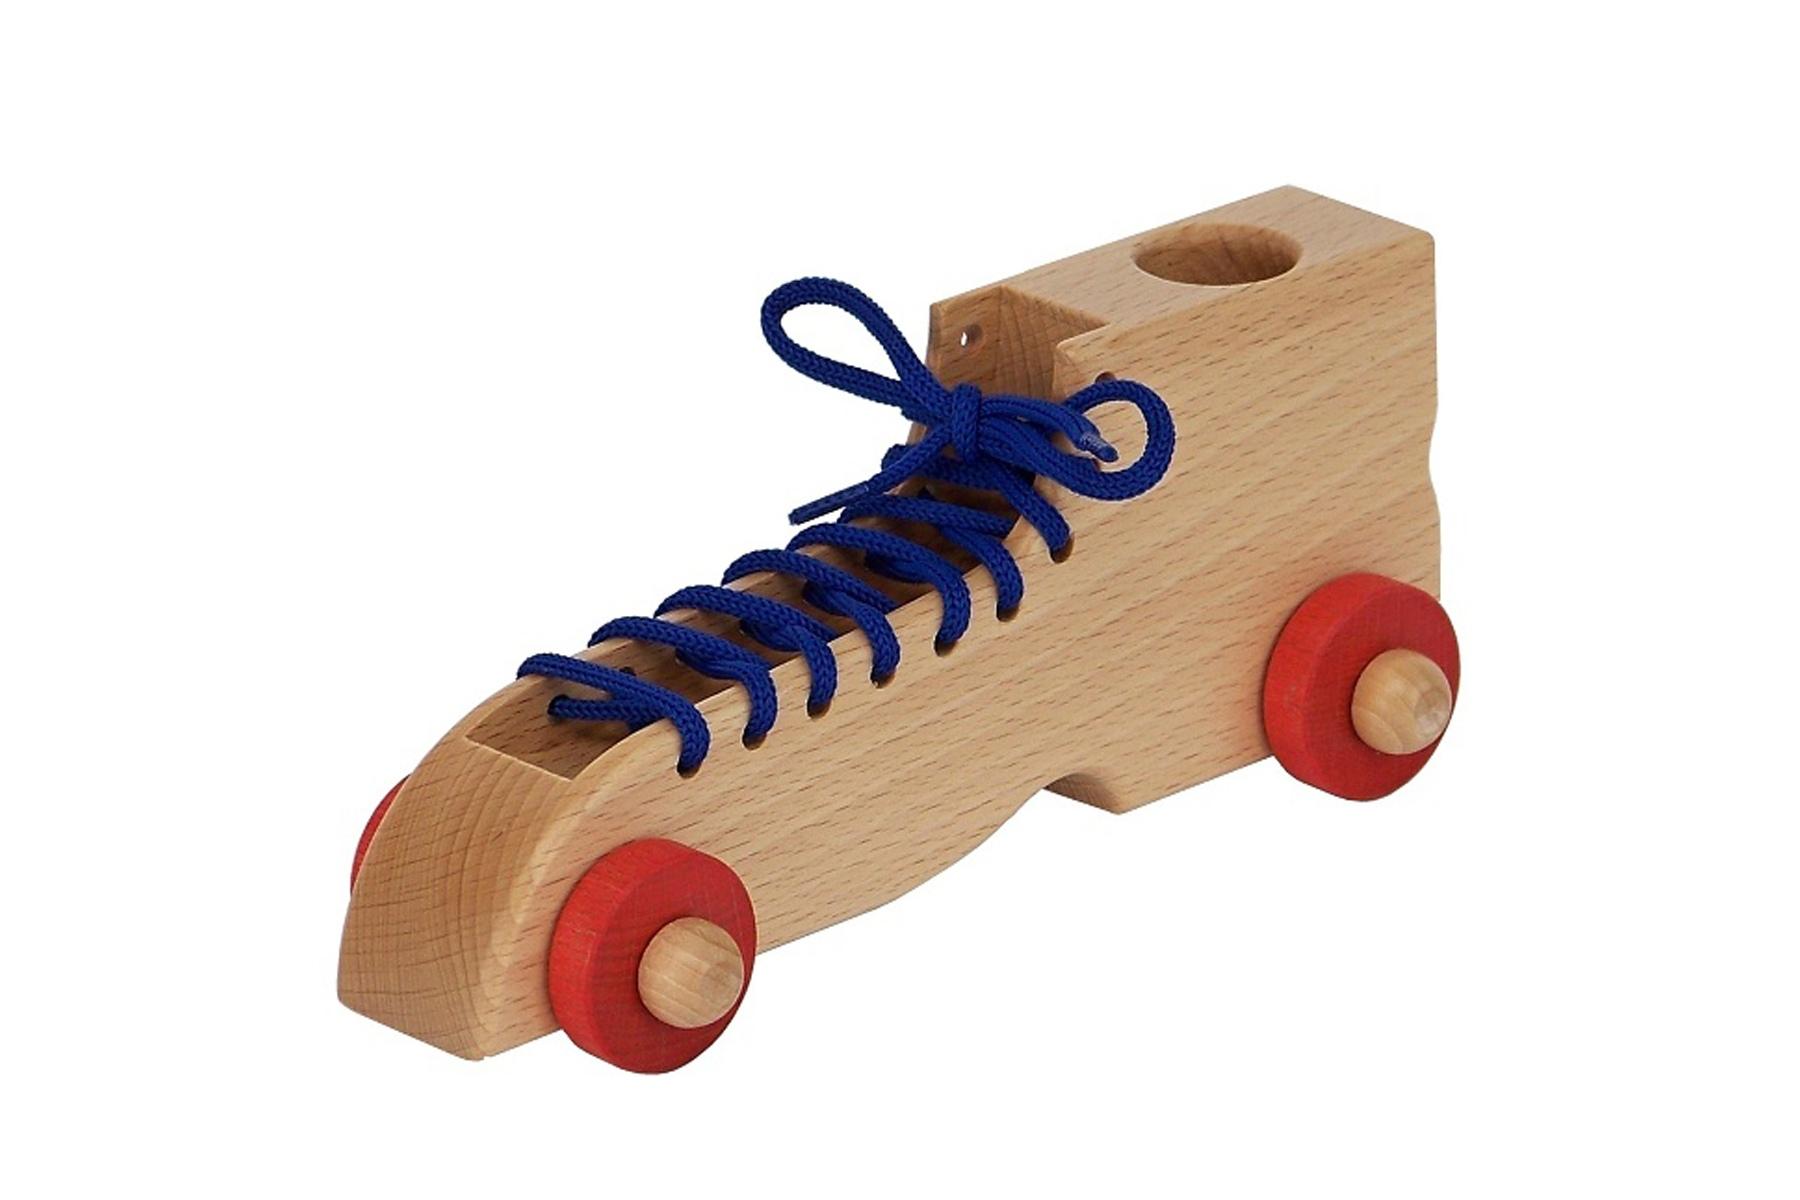 chaussure lacer en bois apprentissage montessori. Black Bedroom Furniture Sets. Home Design Ideas